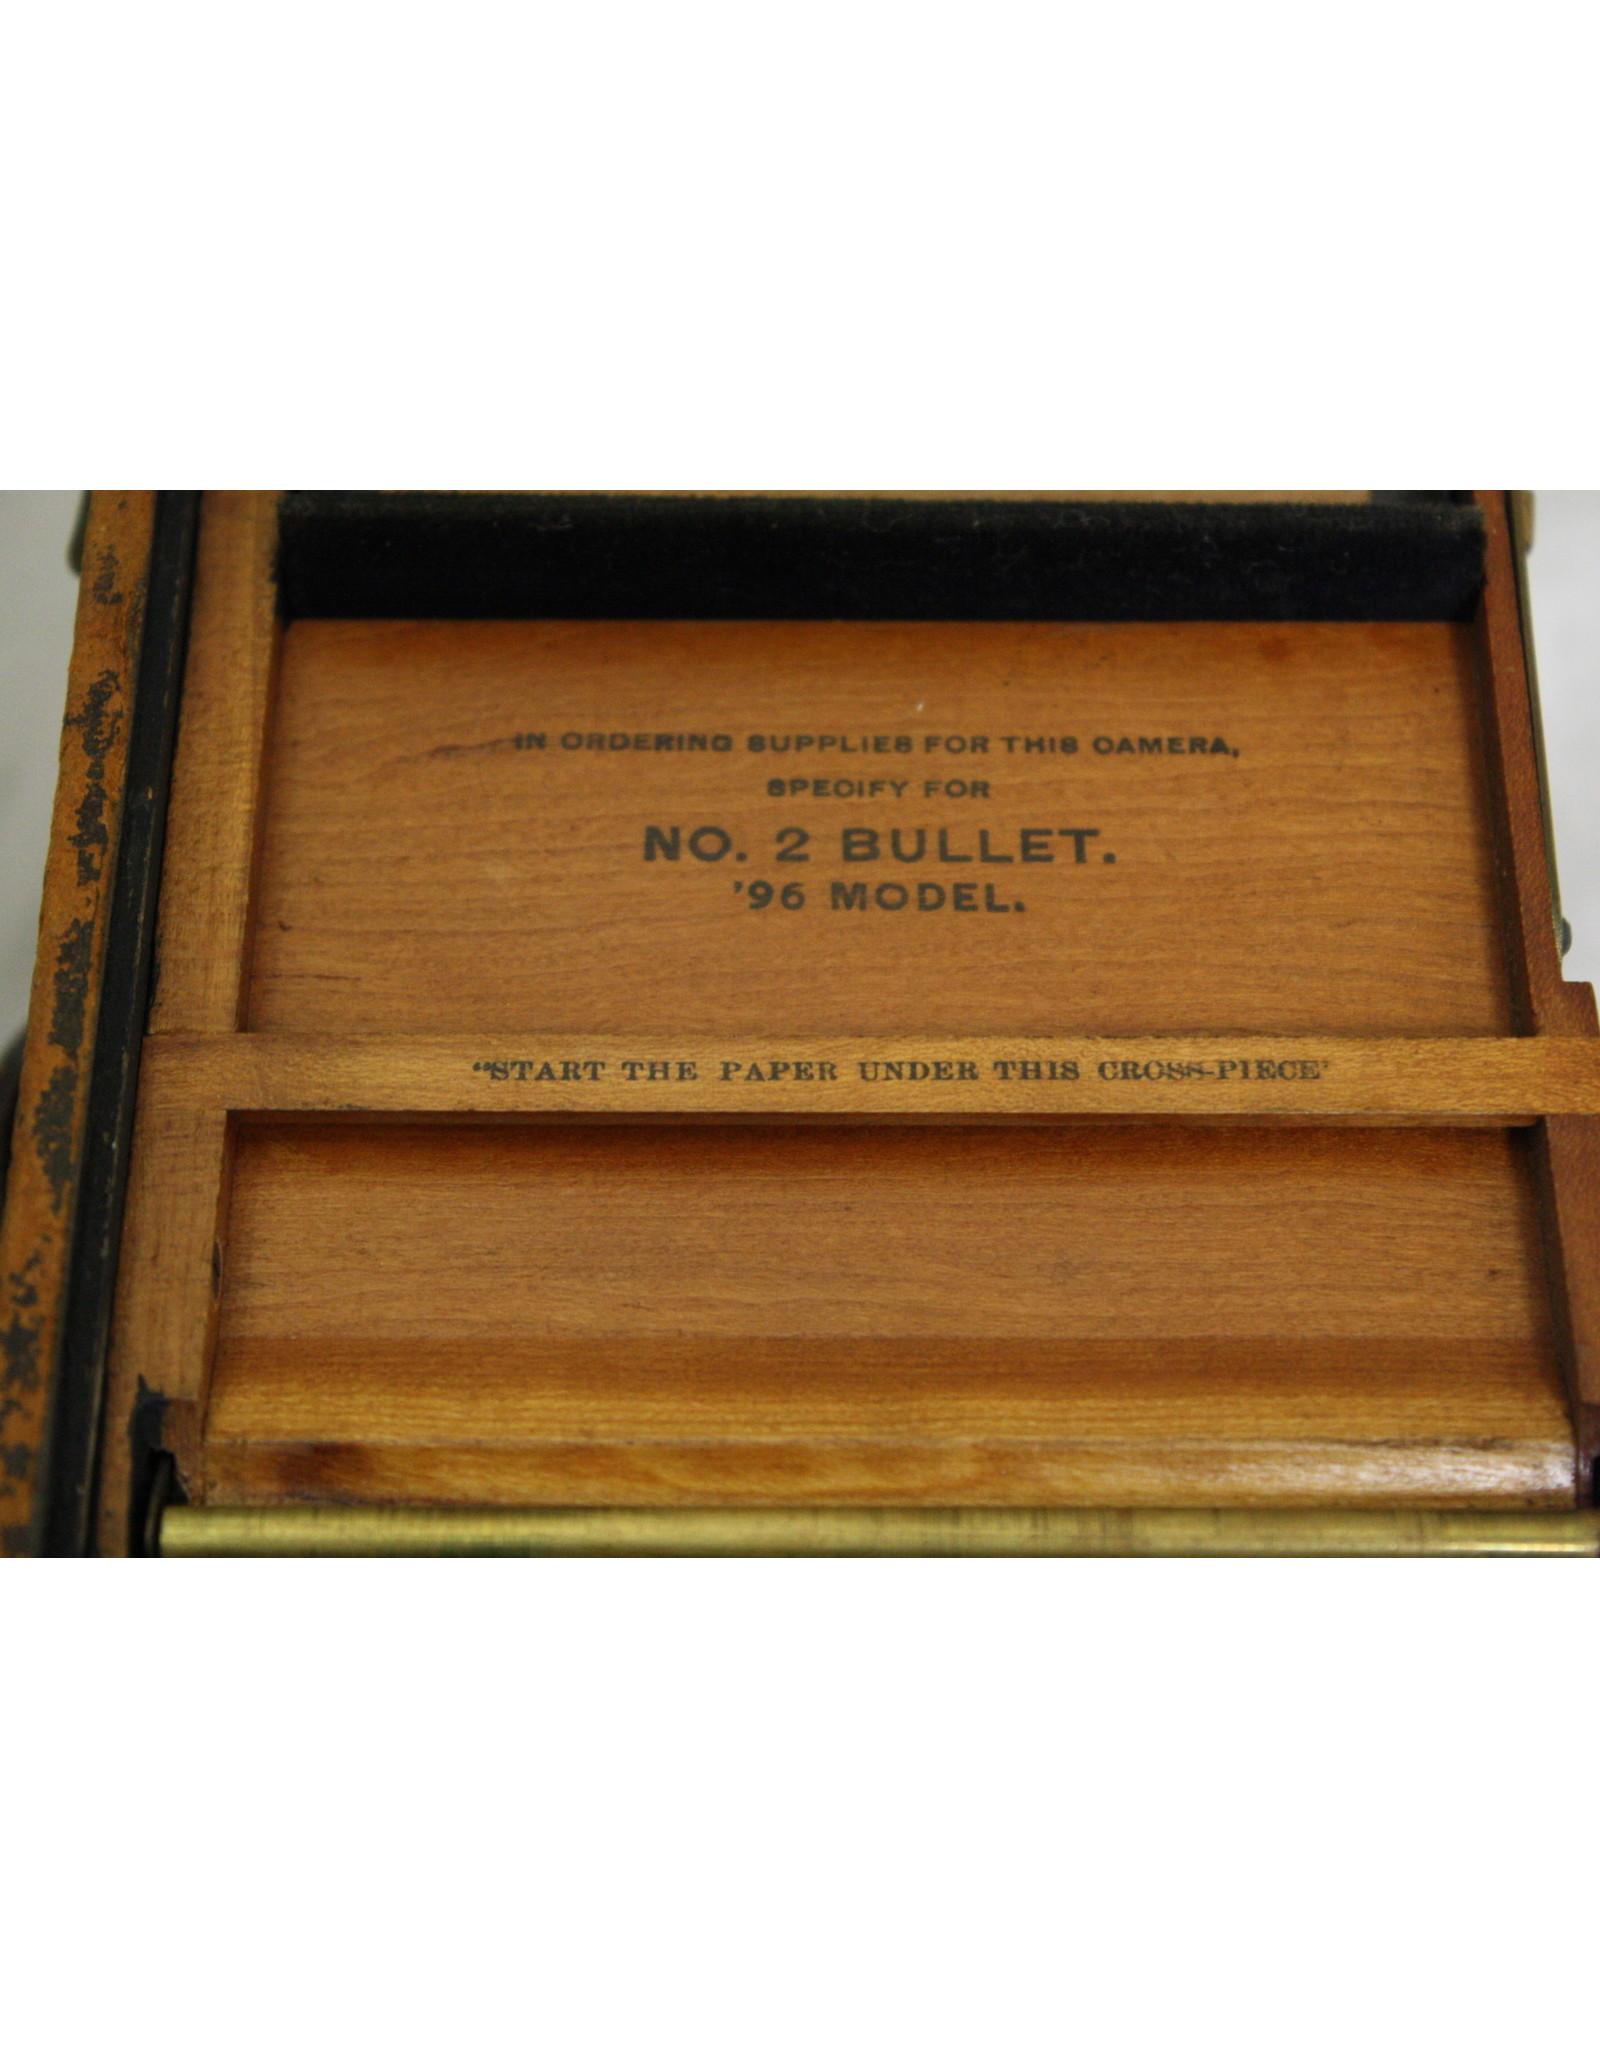 BOX CAMERA KODAK NO. 2 BULLET 96 MODEL ANTIQUE CUSTOM 122 YRS. OLD, BOCOTE WOOD